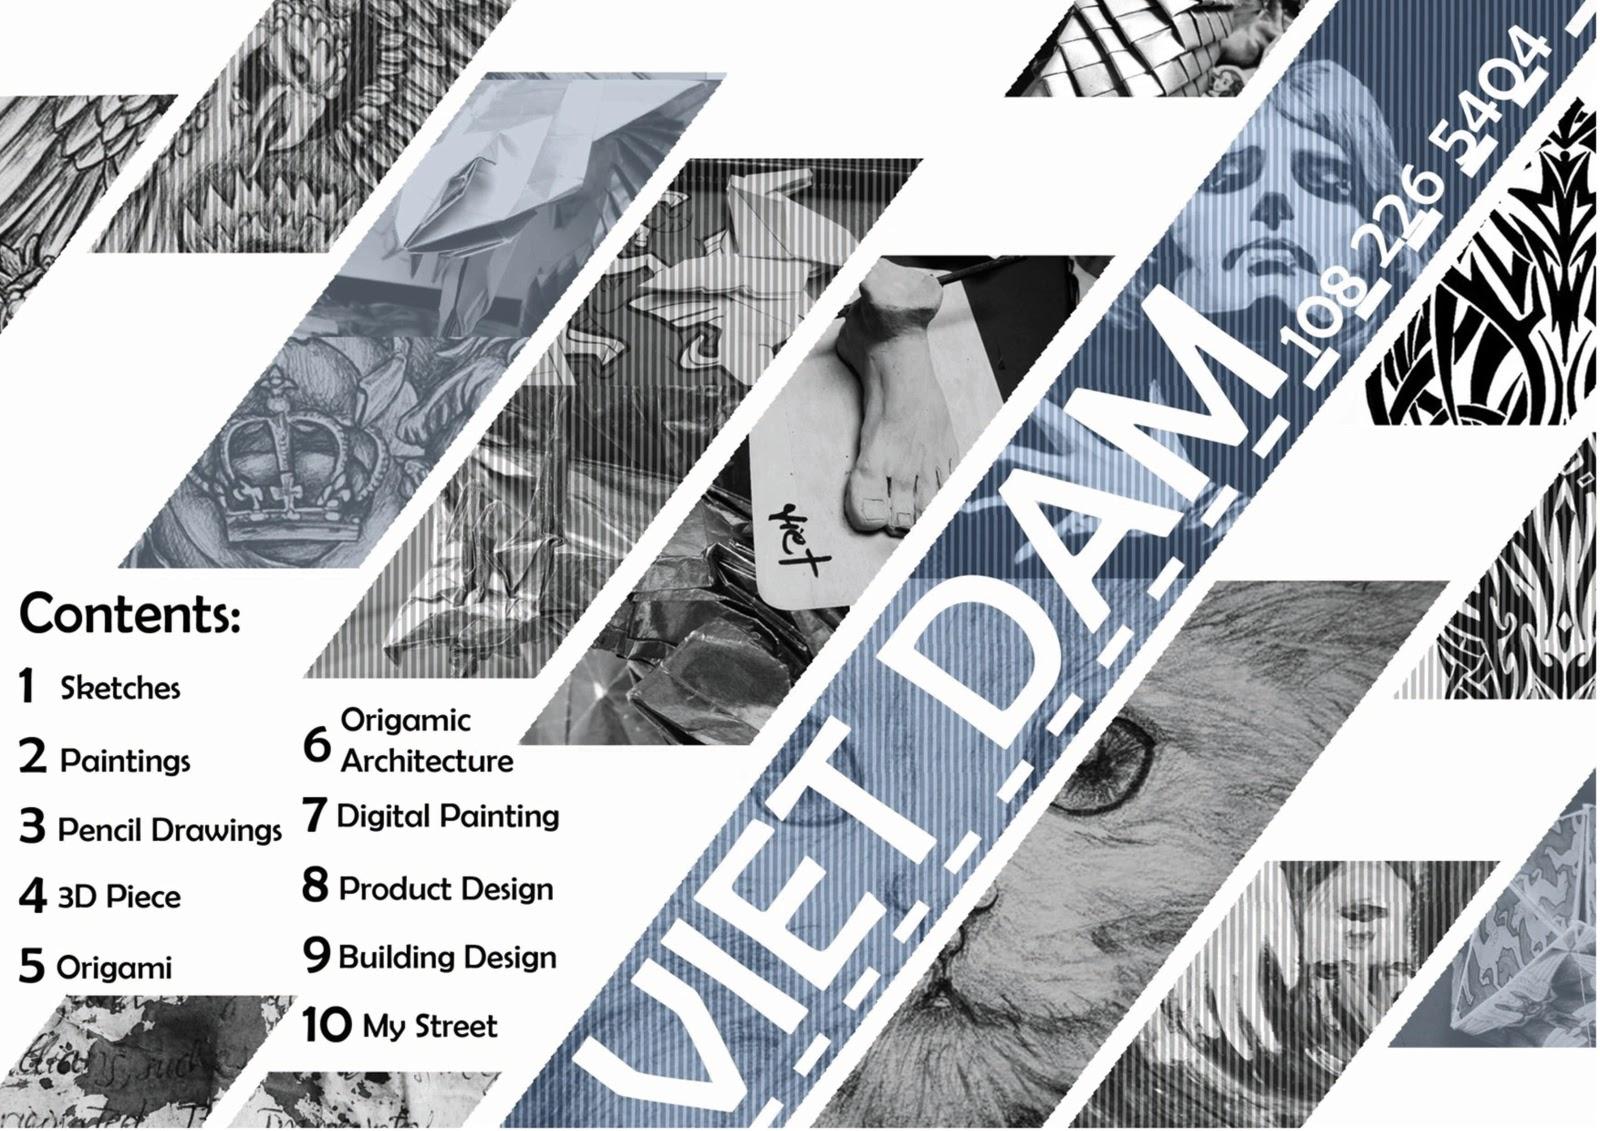 Ben noto Architecture Portfolio for University of Sheffield: Here it is! DP44